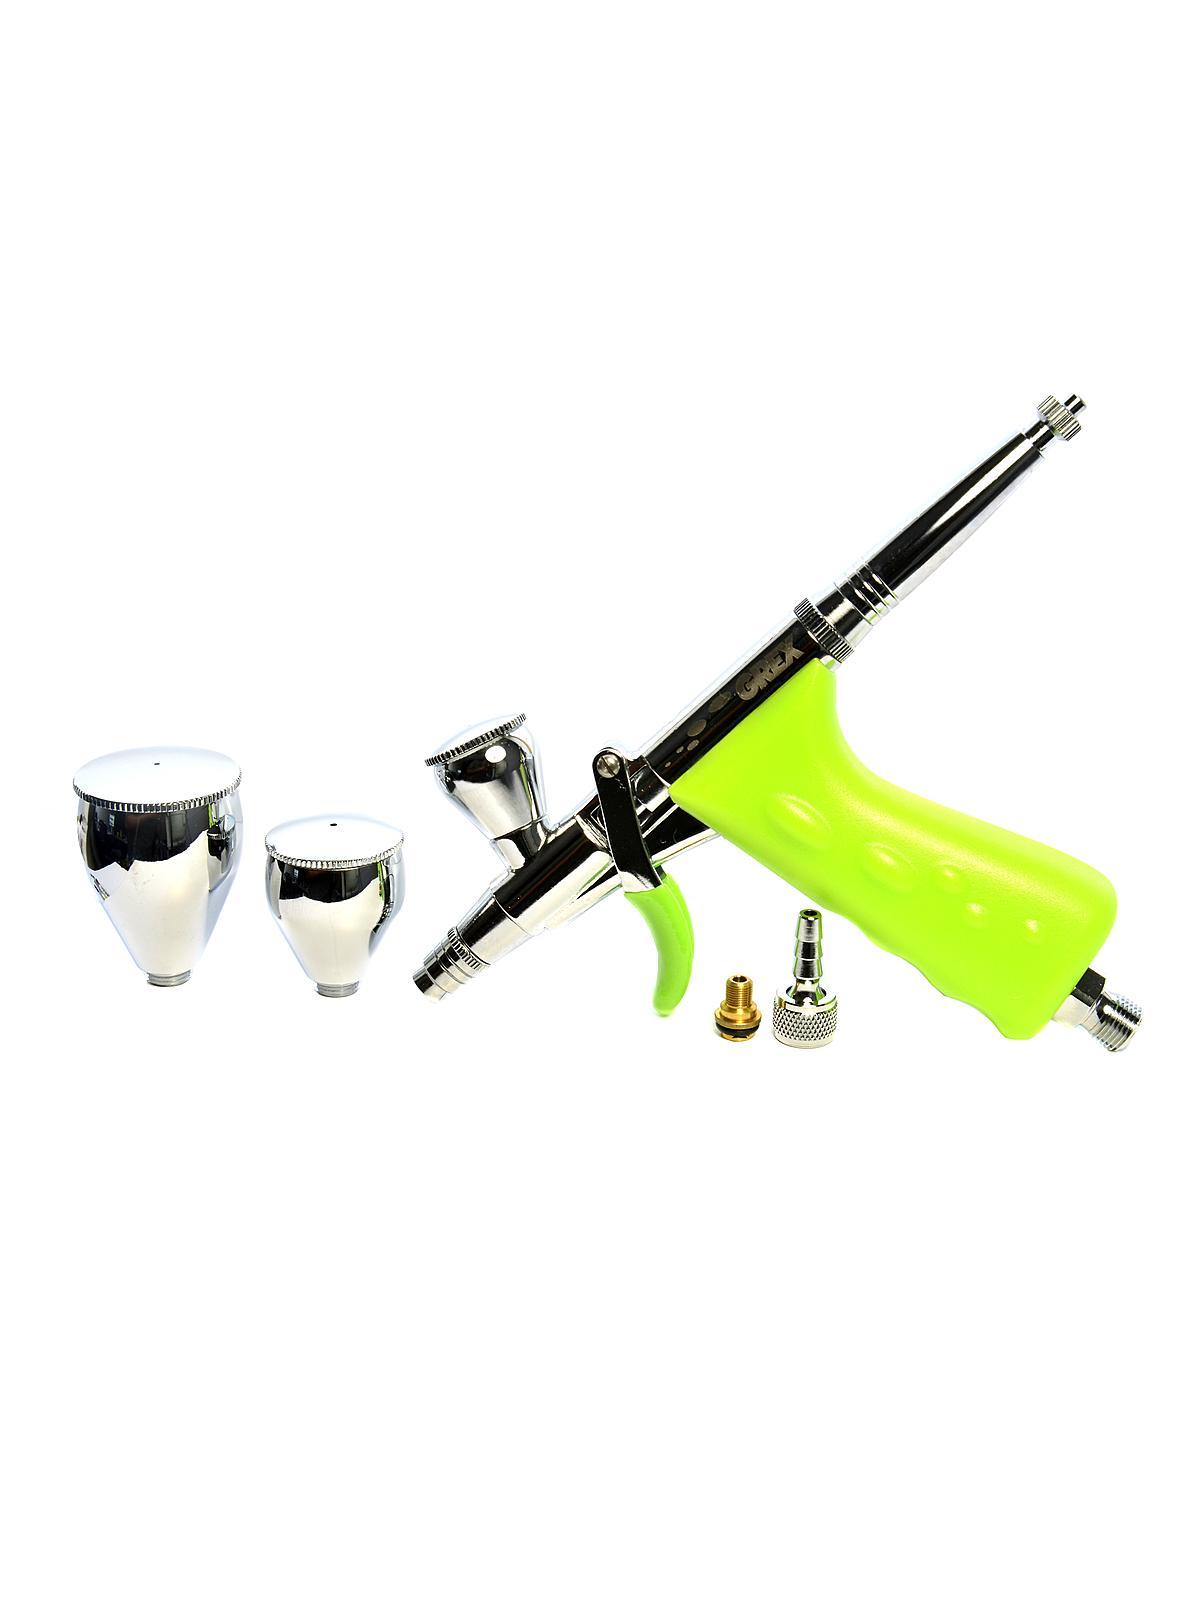 Tritium TG5 Double Action Pistol Style Trigger Gravity Feed Airbush